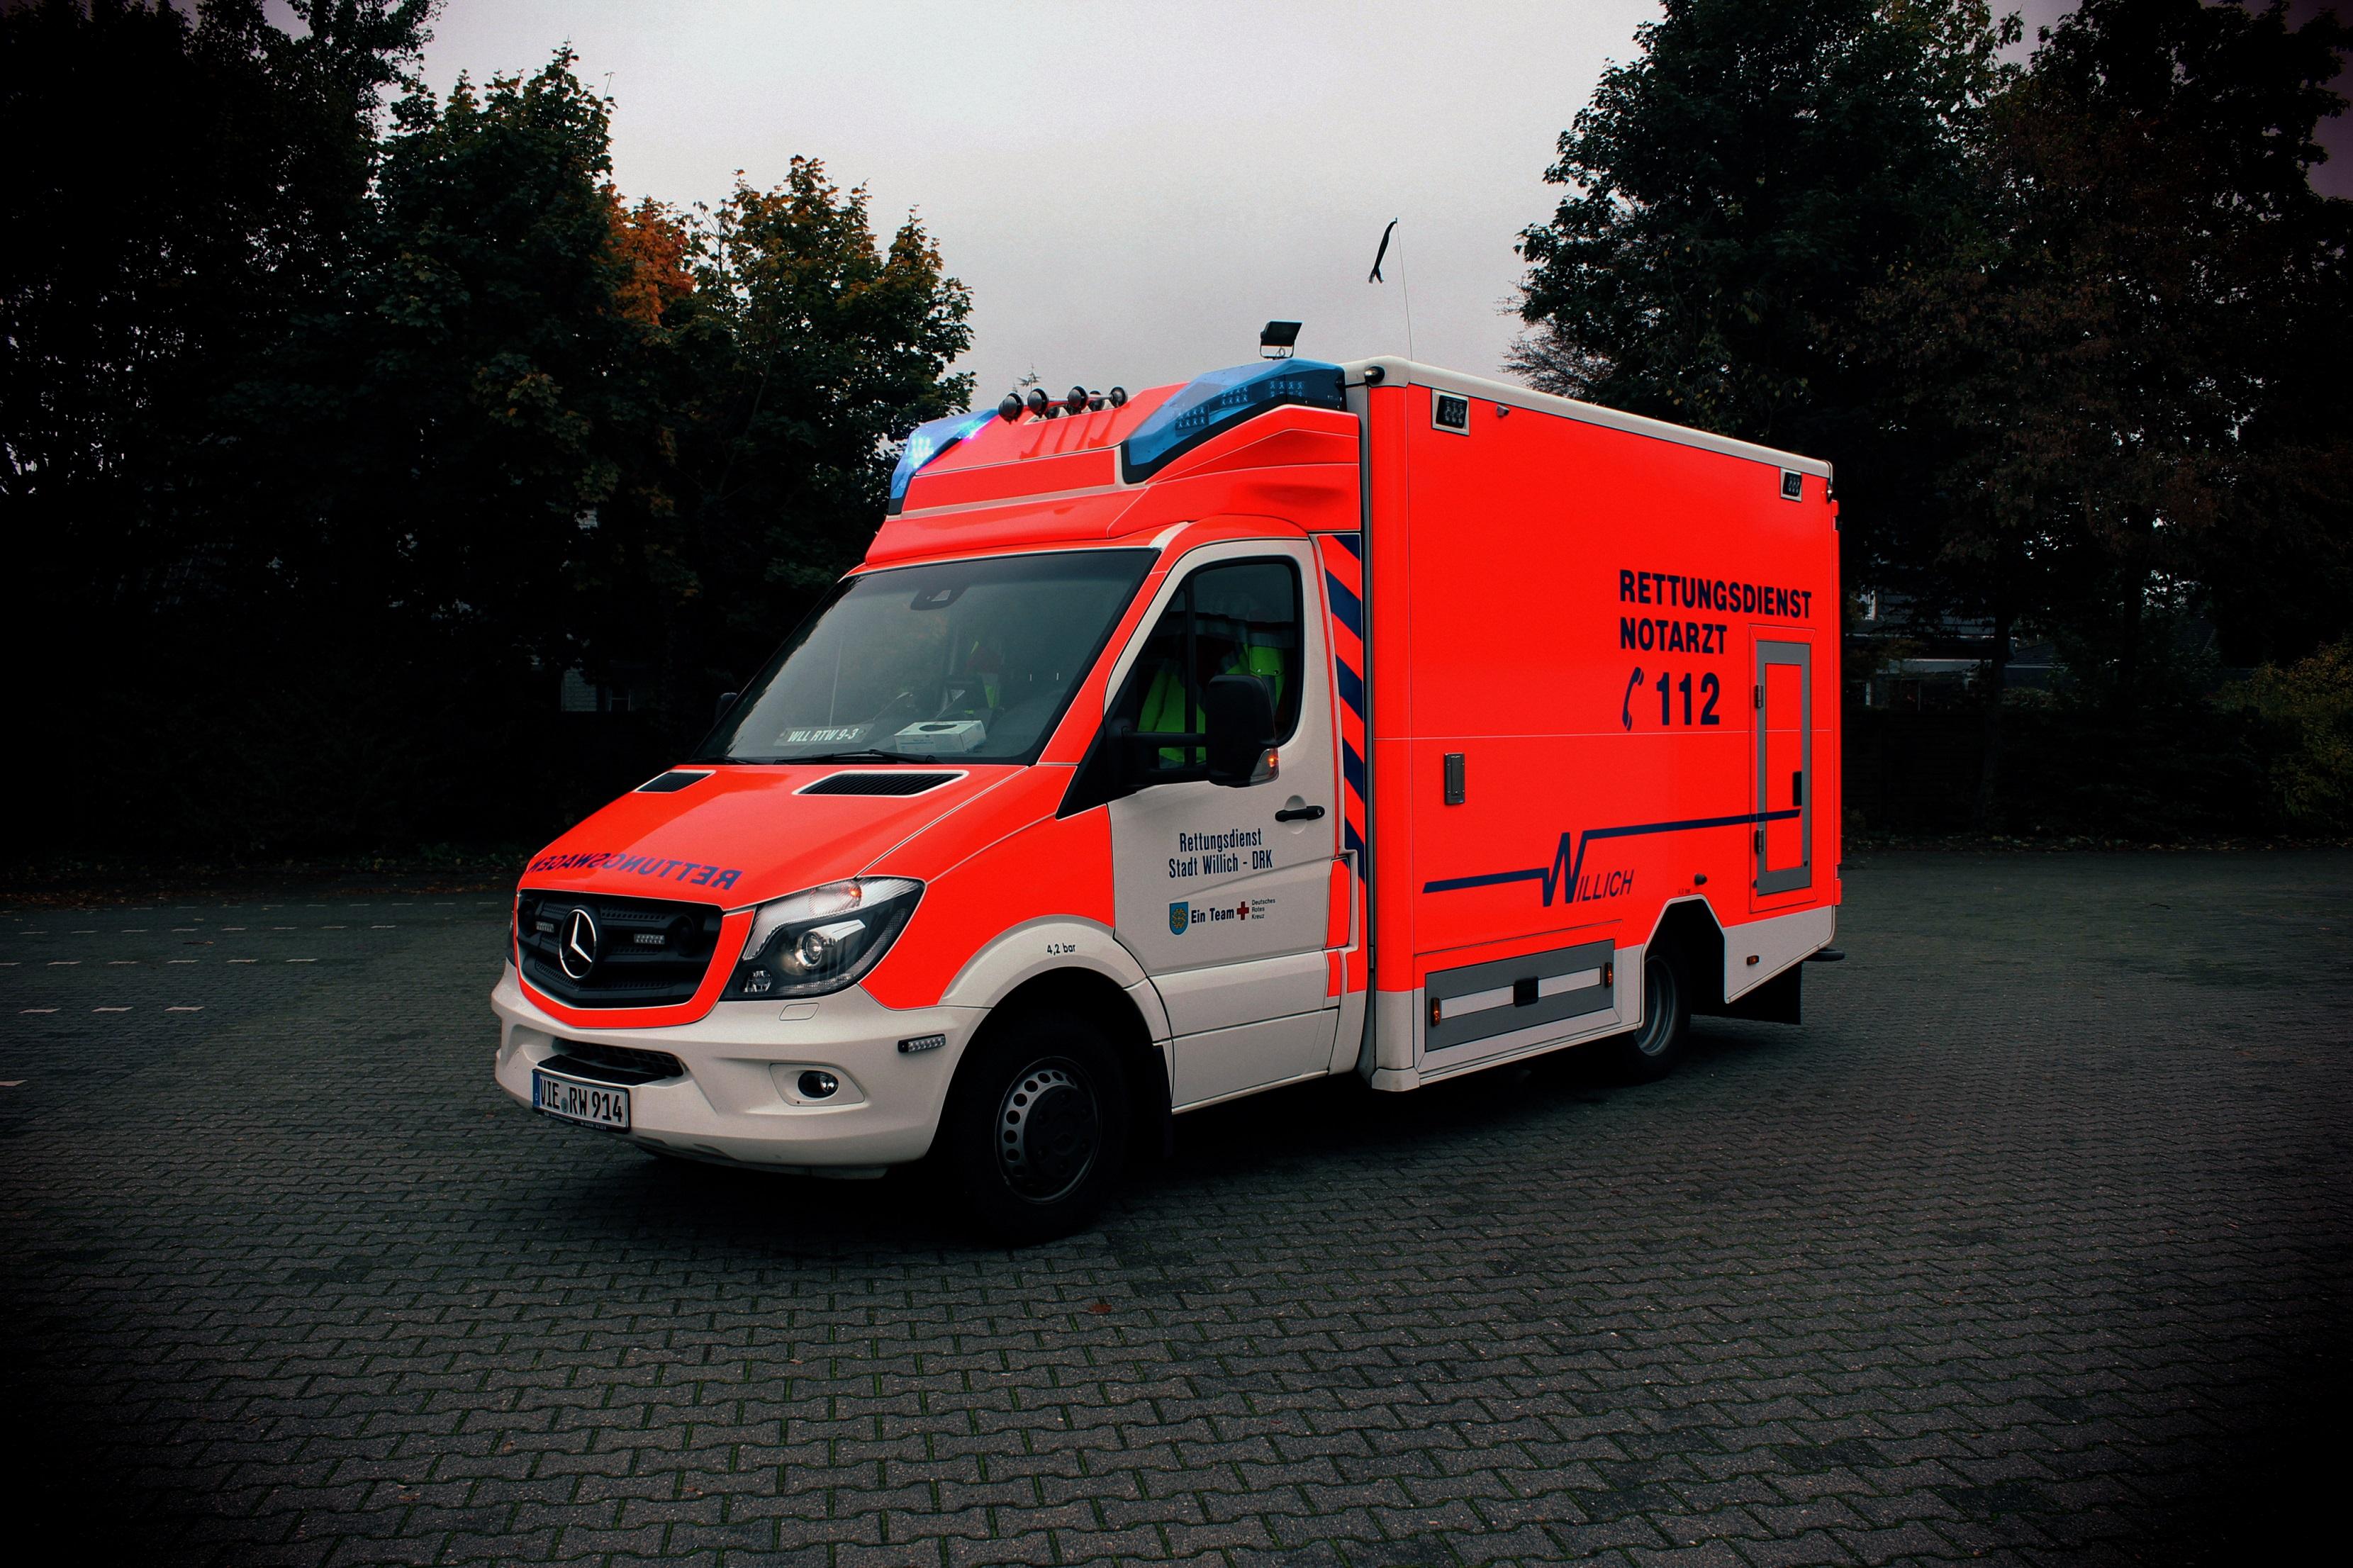 Rettungswagen 3